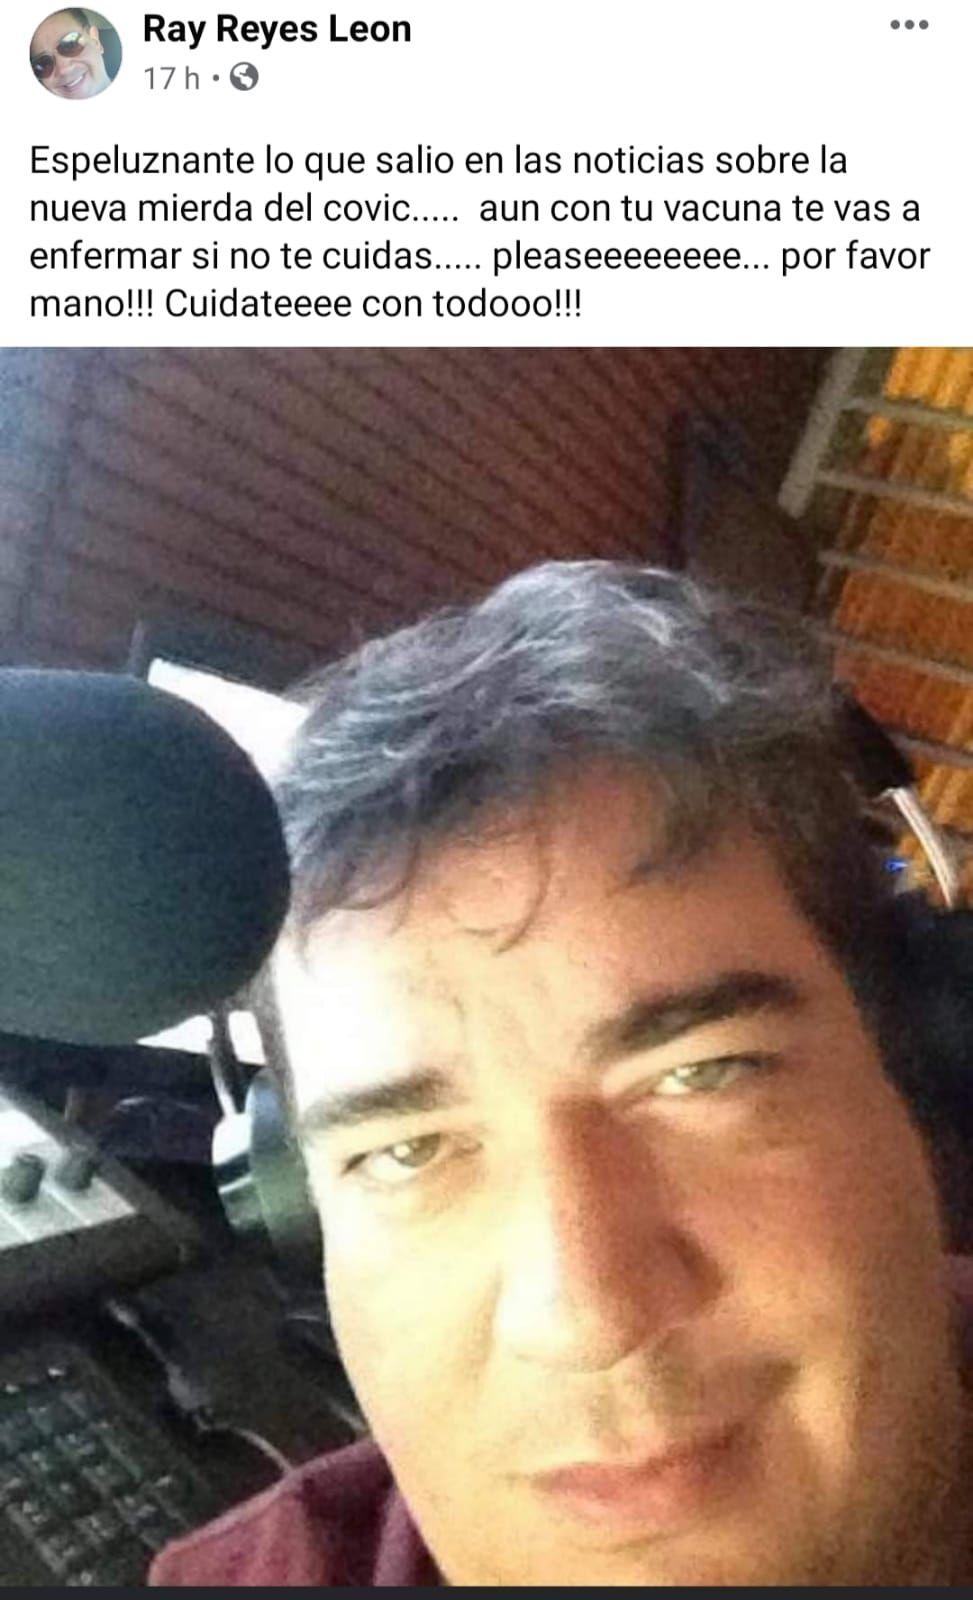 Murió Ray Reyes, ex Menudo